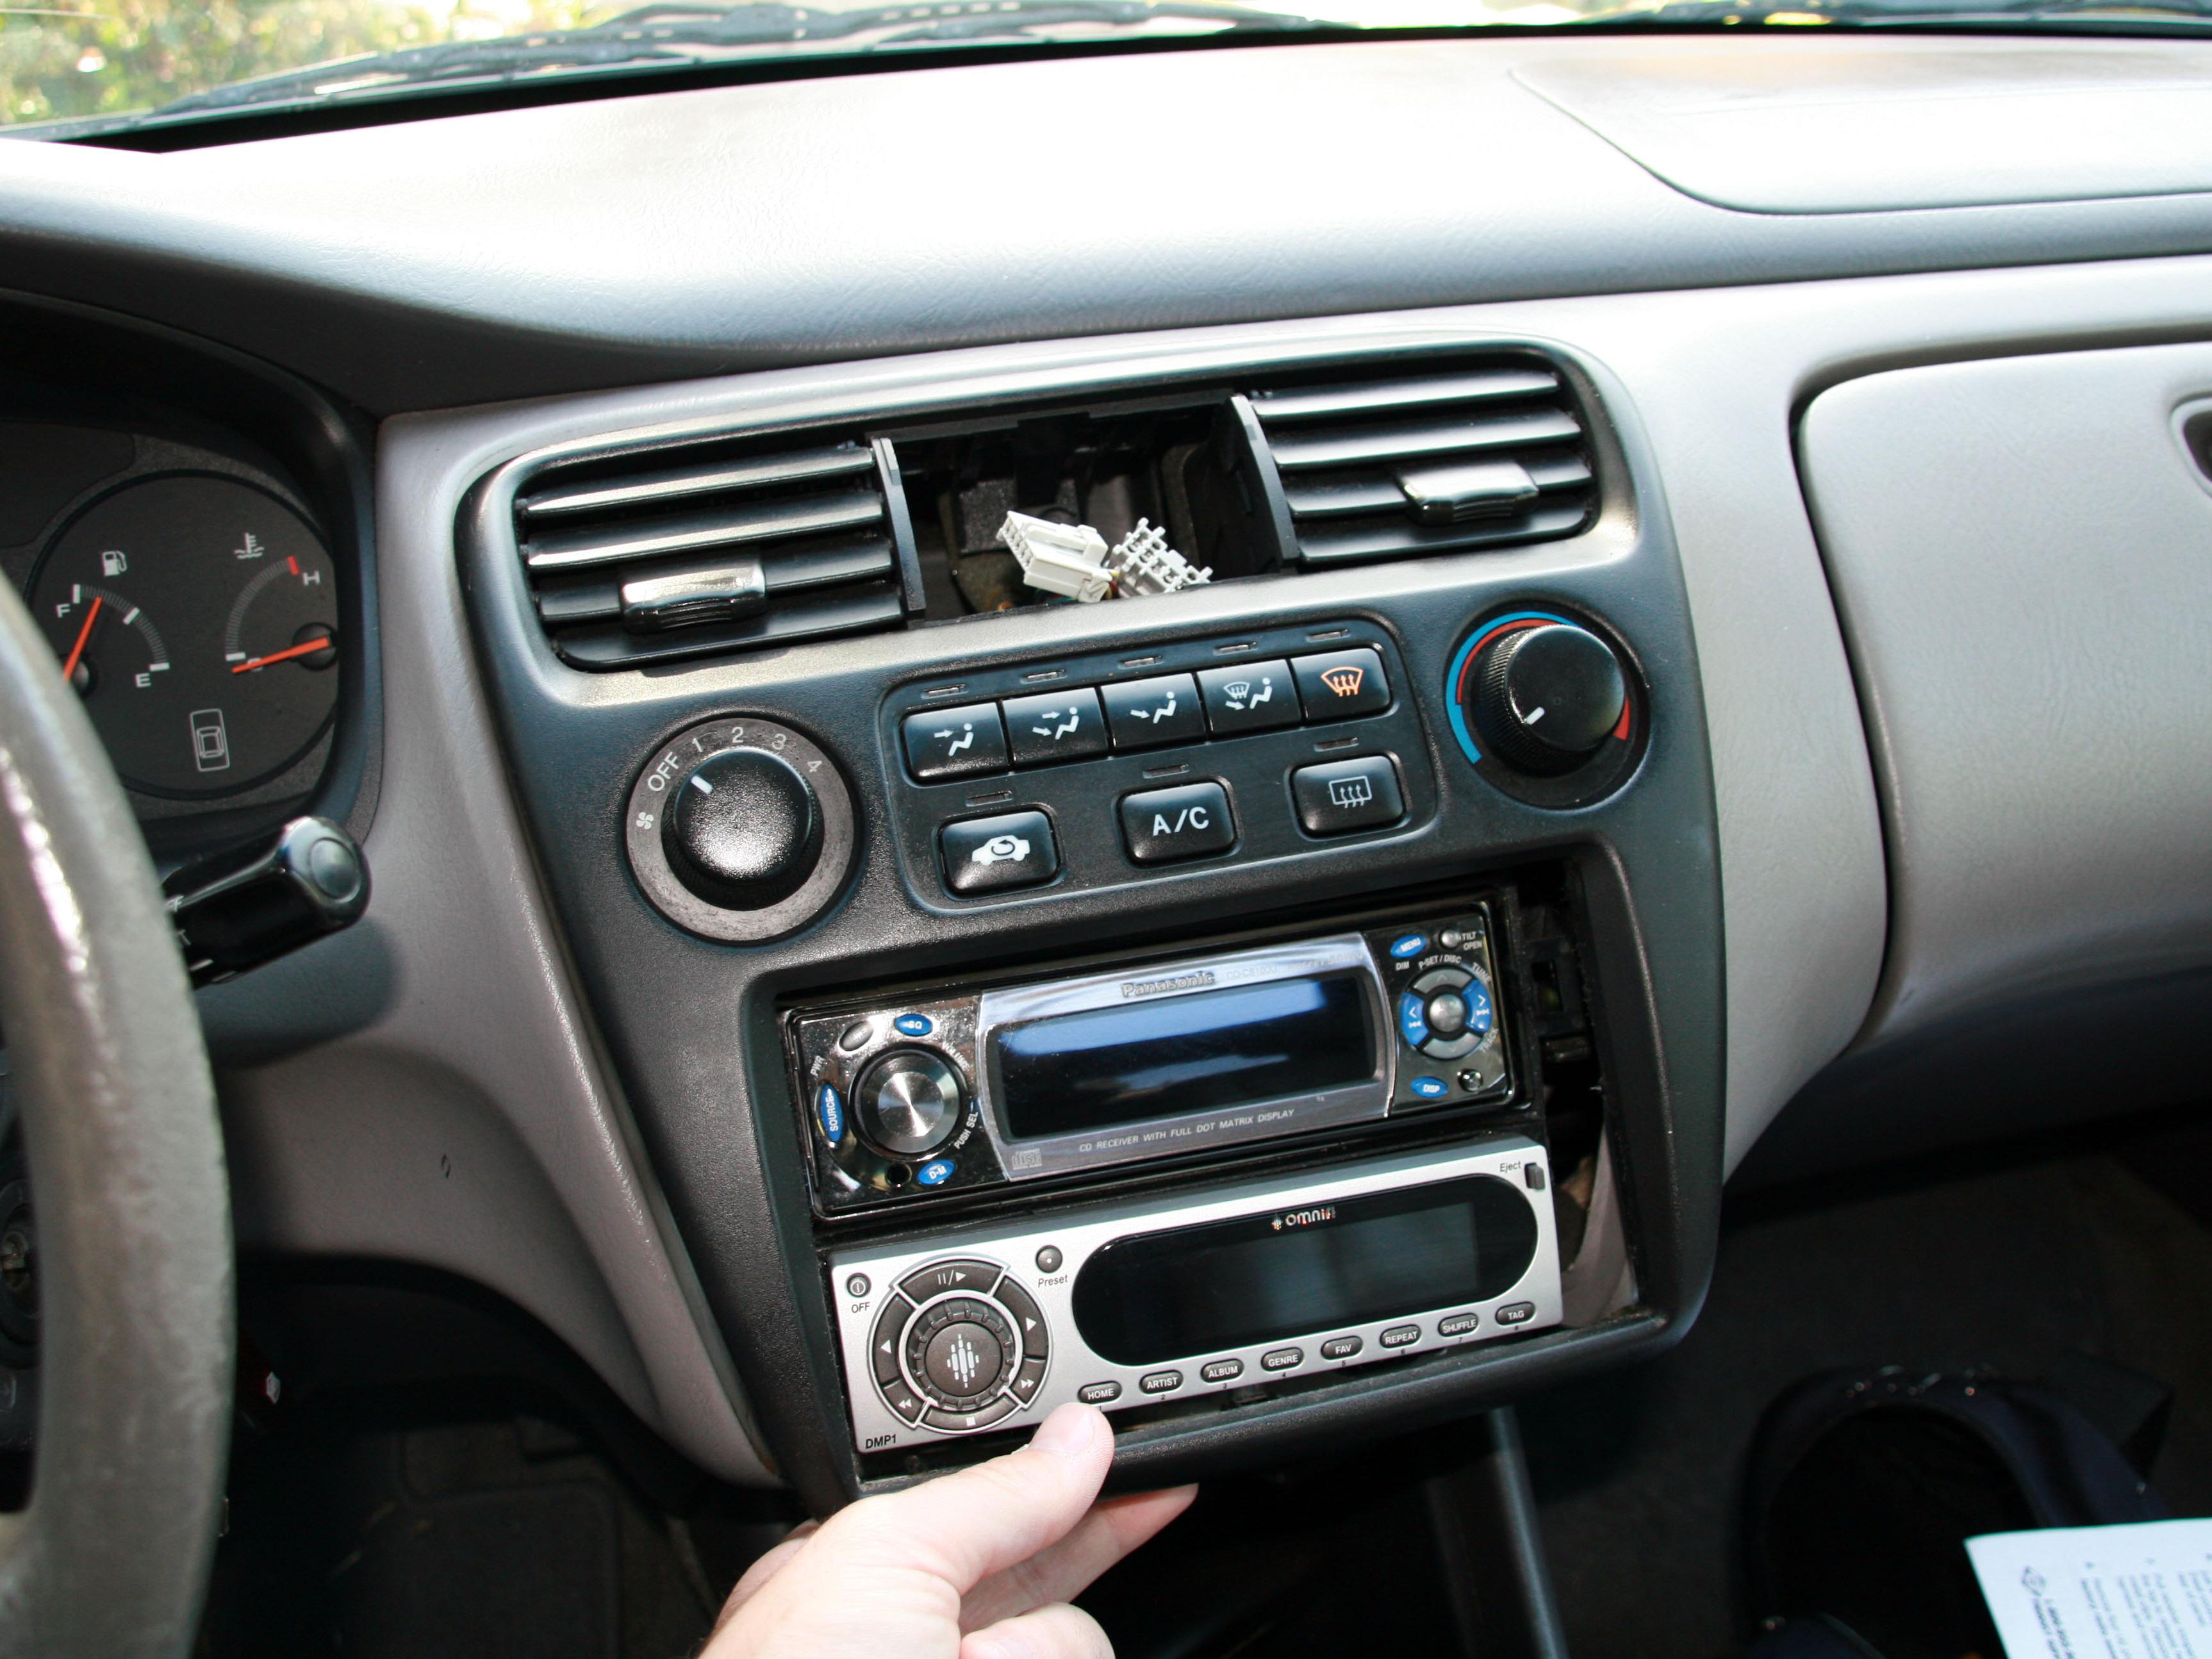 2001 Honda Civic Radio Wiring Diagram View Diagram 2001 Honda Civic Ex